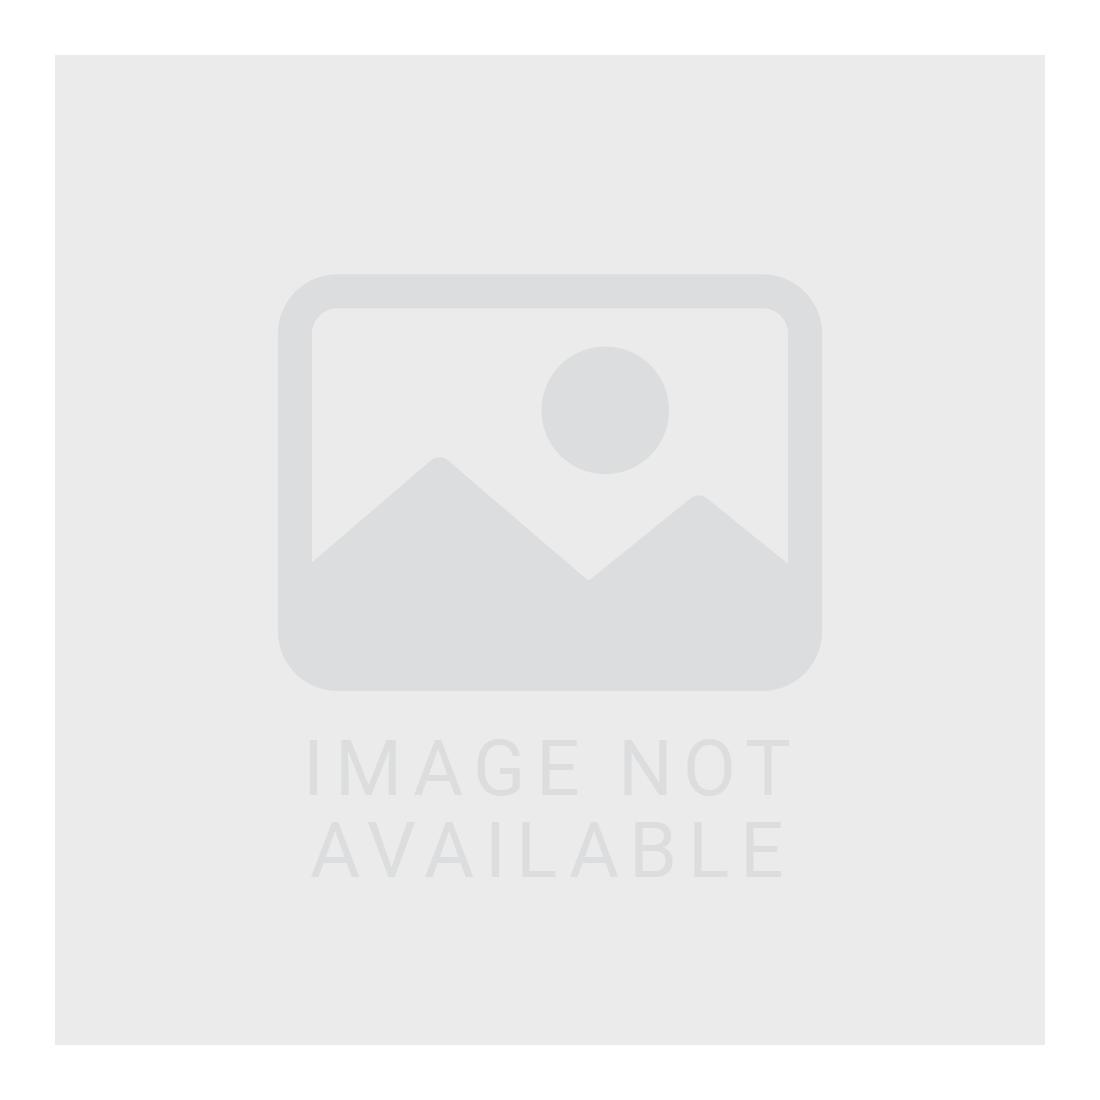 Warm Your Engine